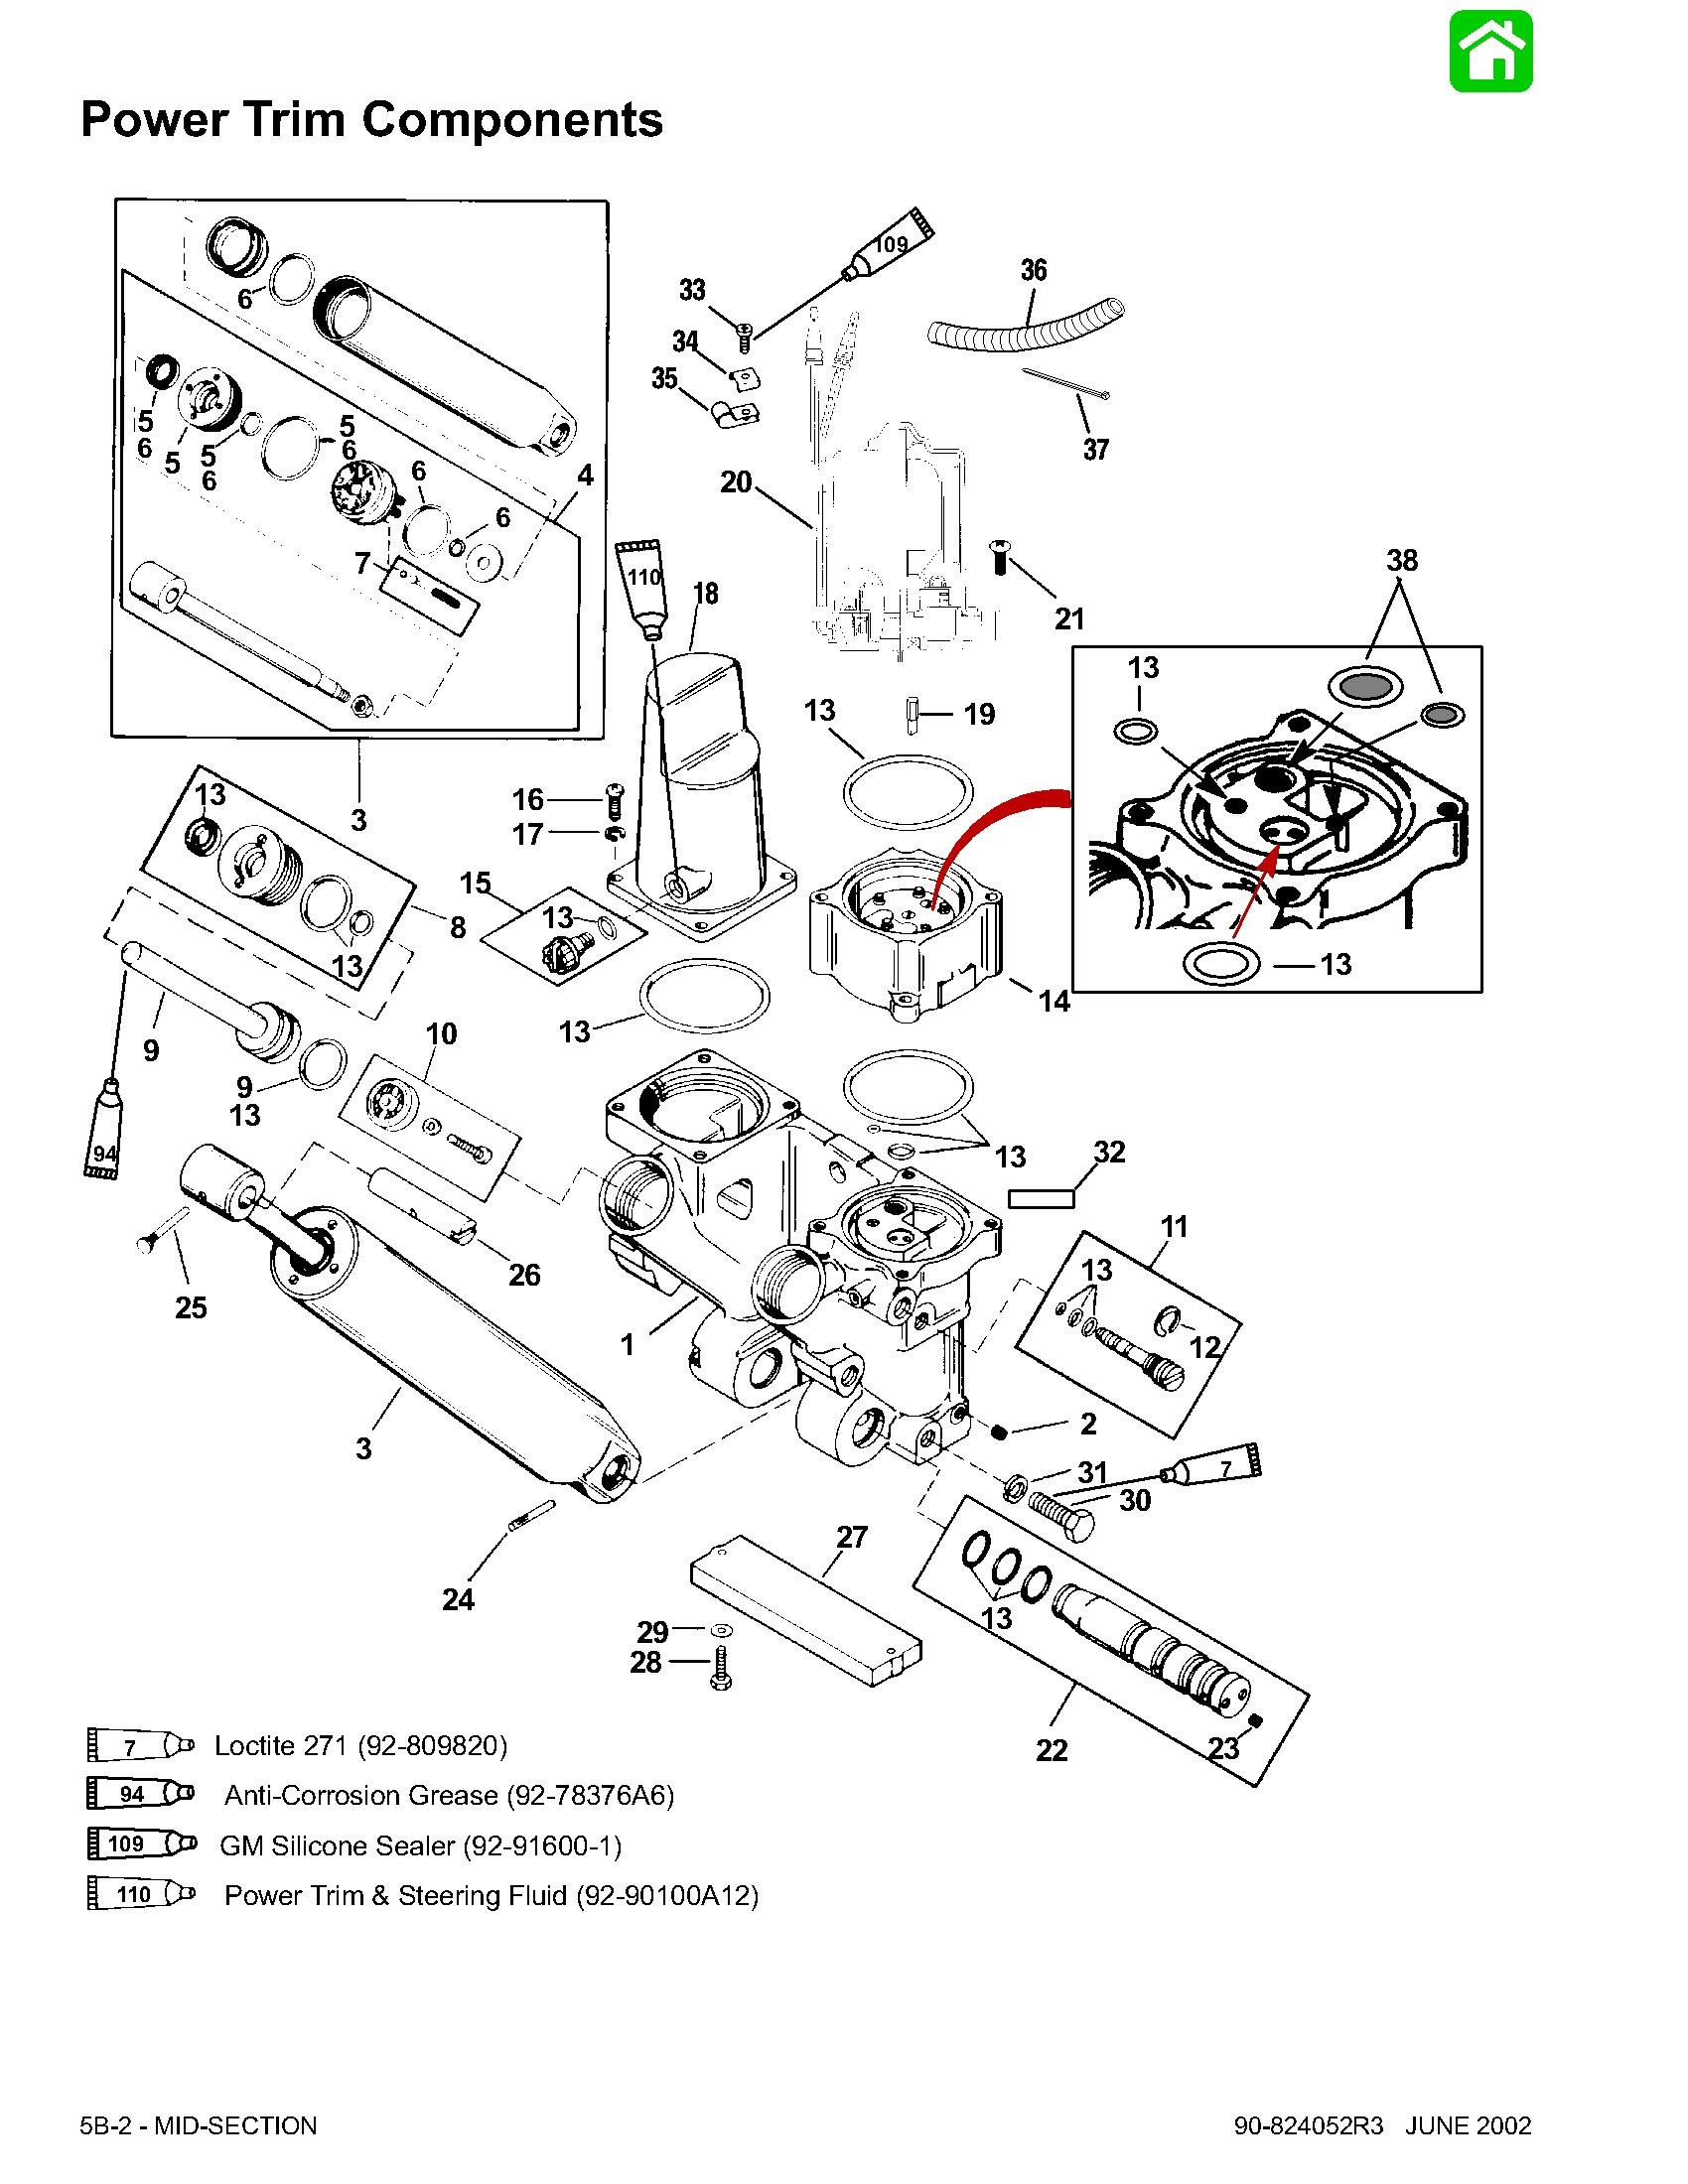 [DIAGRAM_1CA]  GT_5780] 1988 Mercury Outboard Diagram Wiring Diagram | 1990 Mercury 150 Wiring Diagram |  | Hete Dome Mohammedshrine Librar Wiring 101